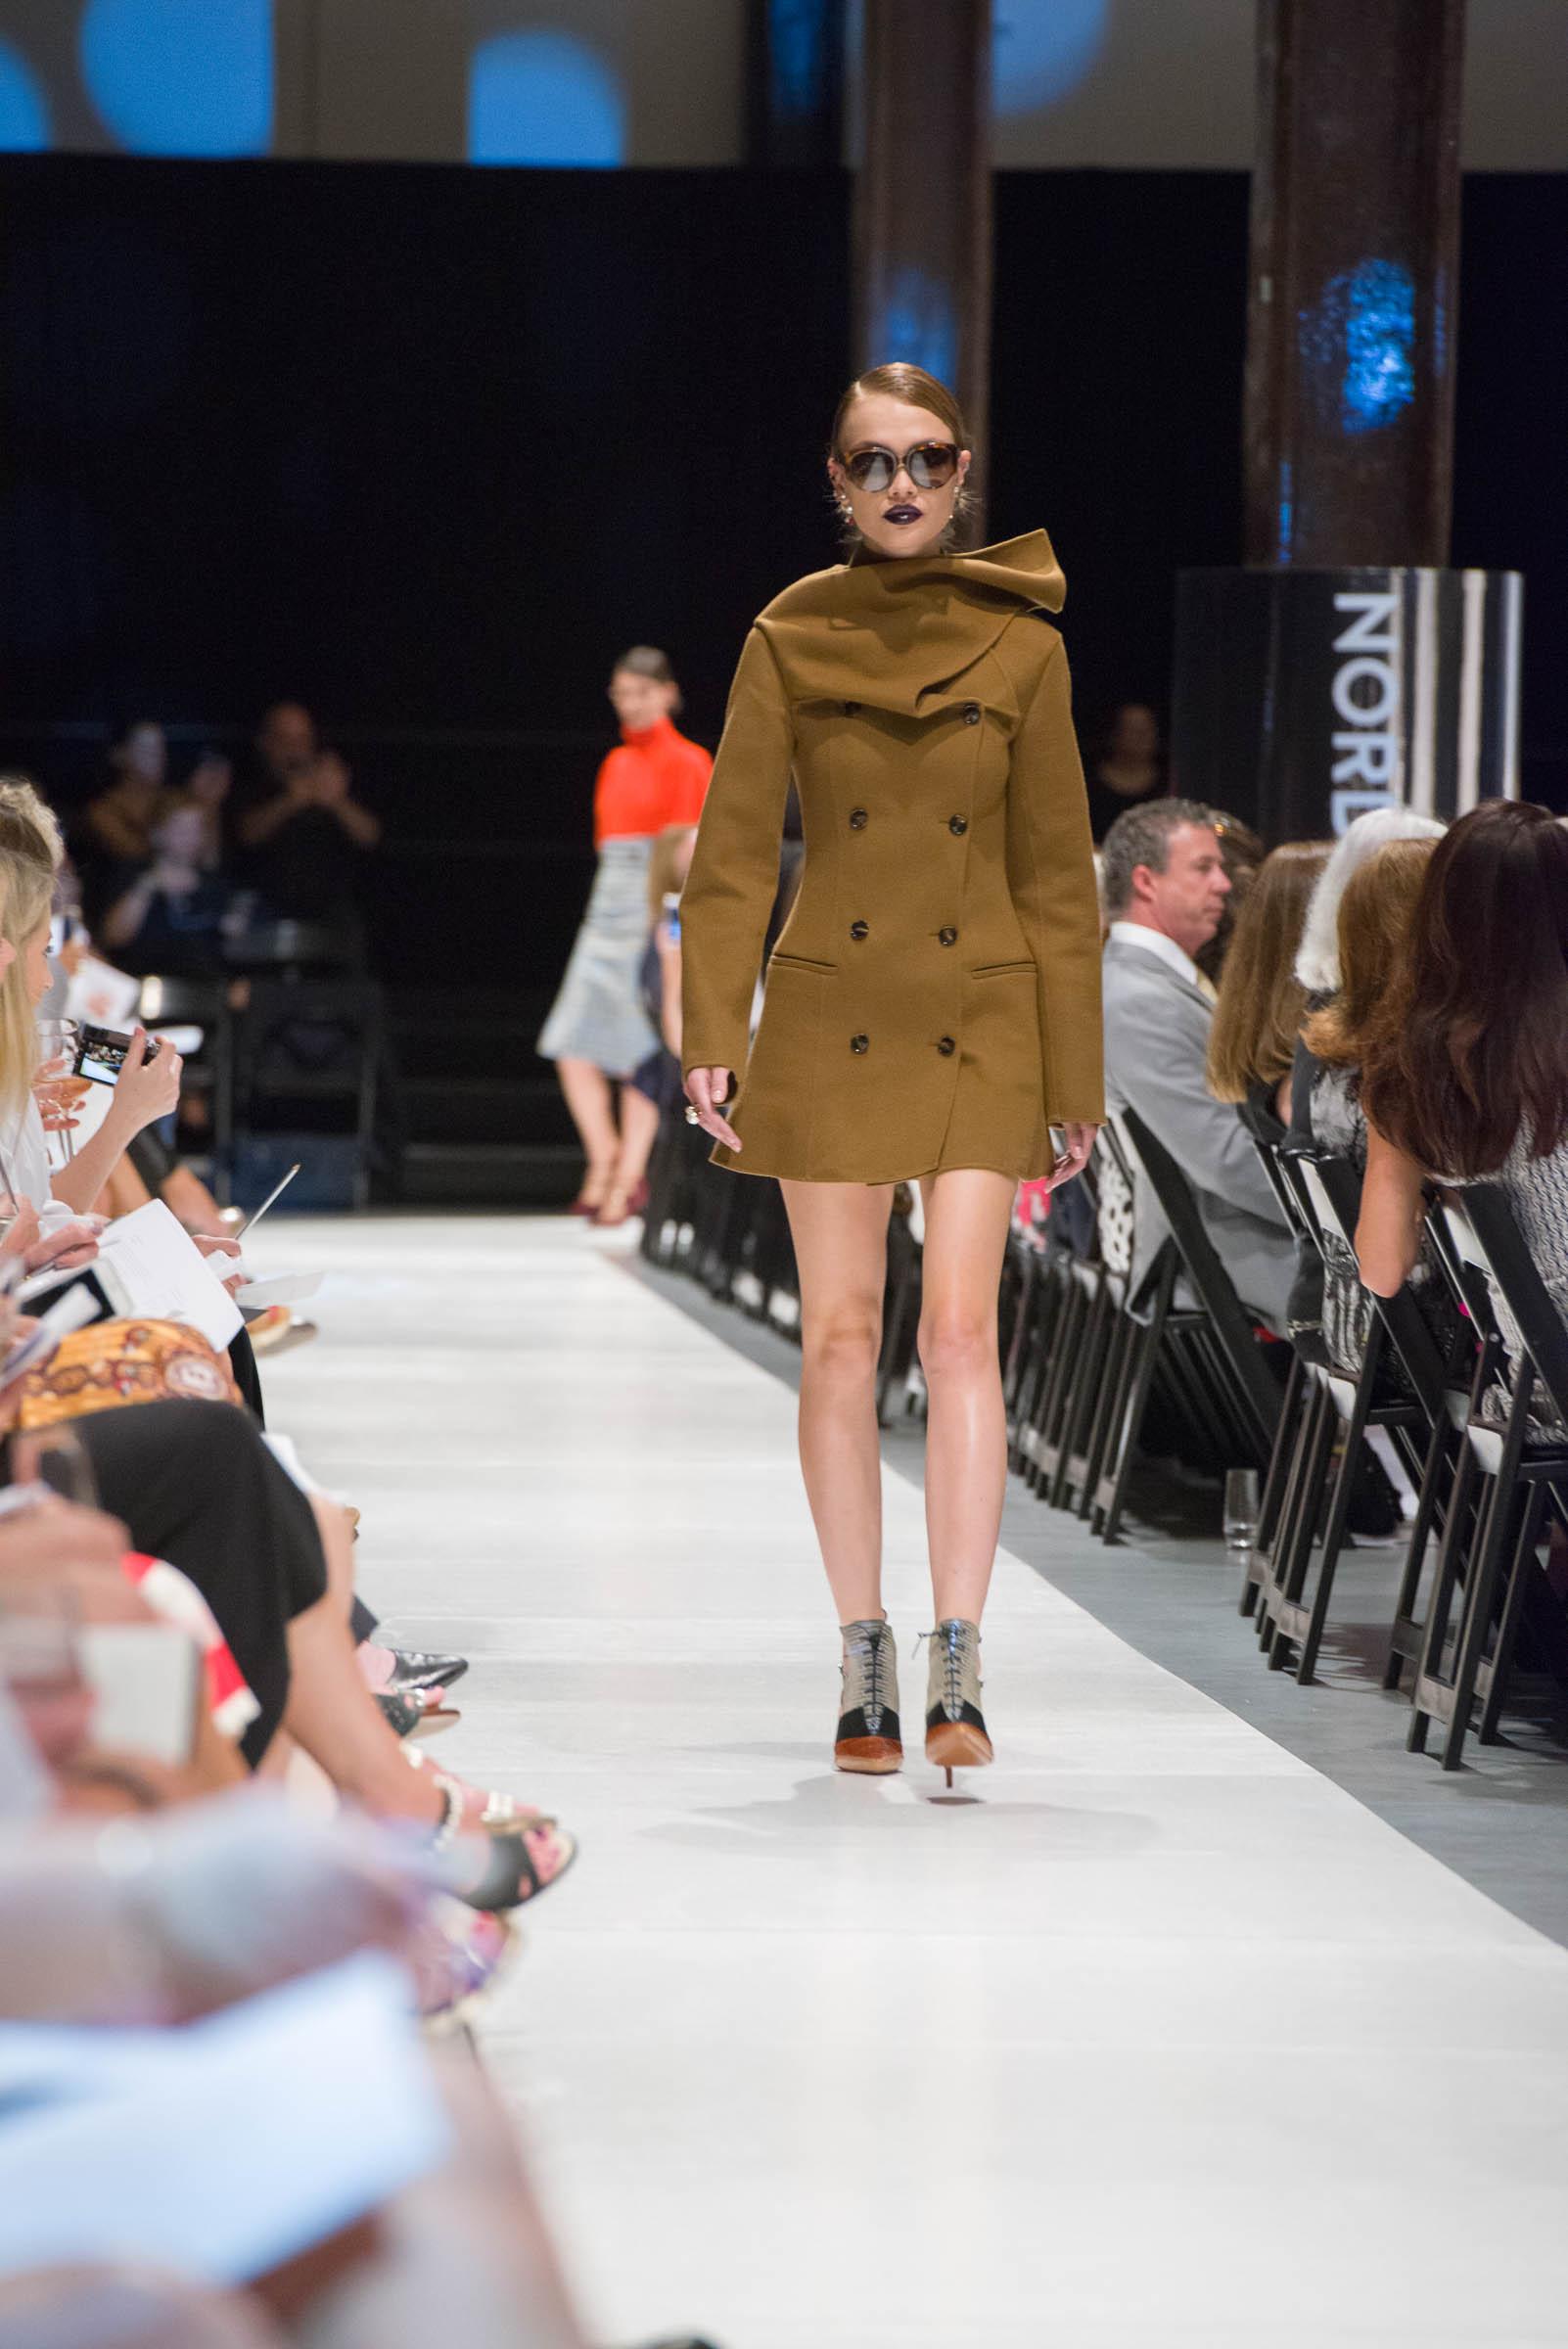 NDP Christian Dior Camel Coat